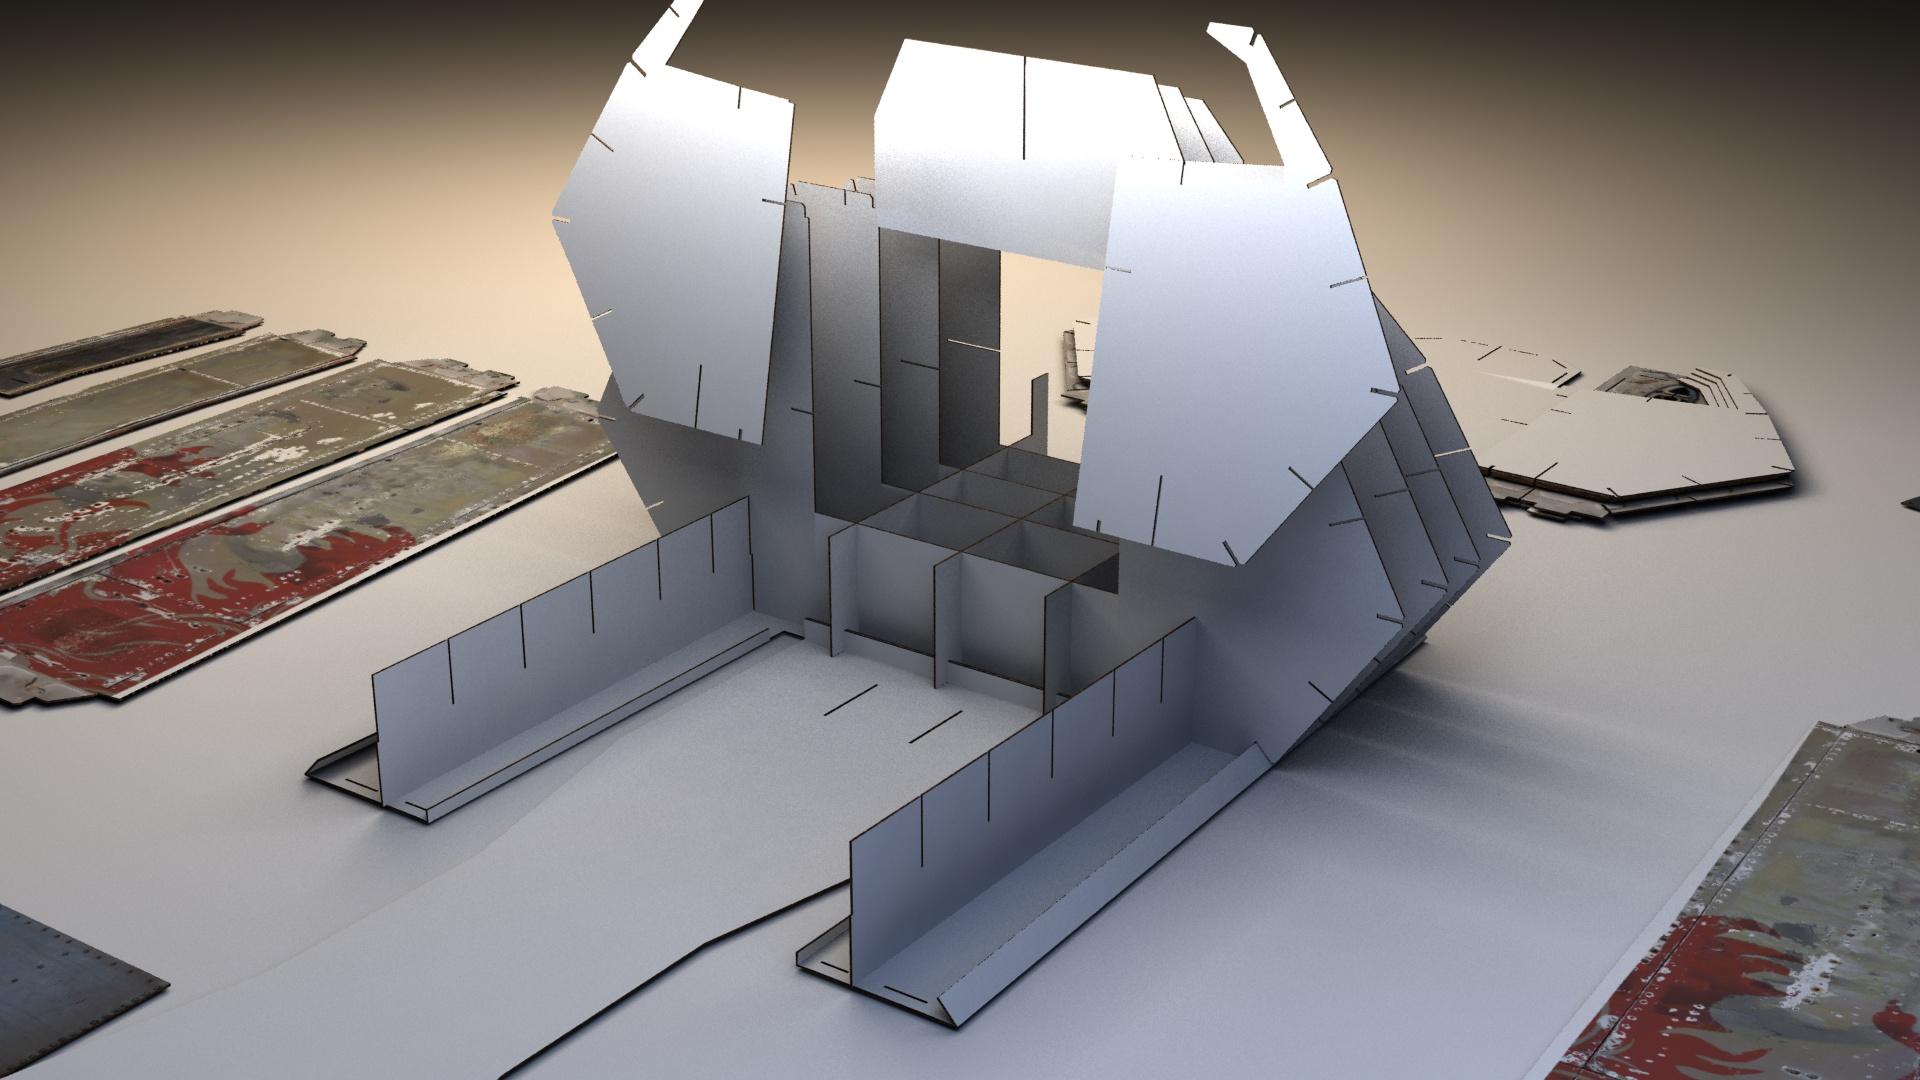 Picture of Fighter Jet Cockpit- Building of the Cockpit